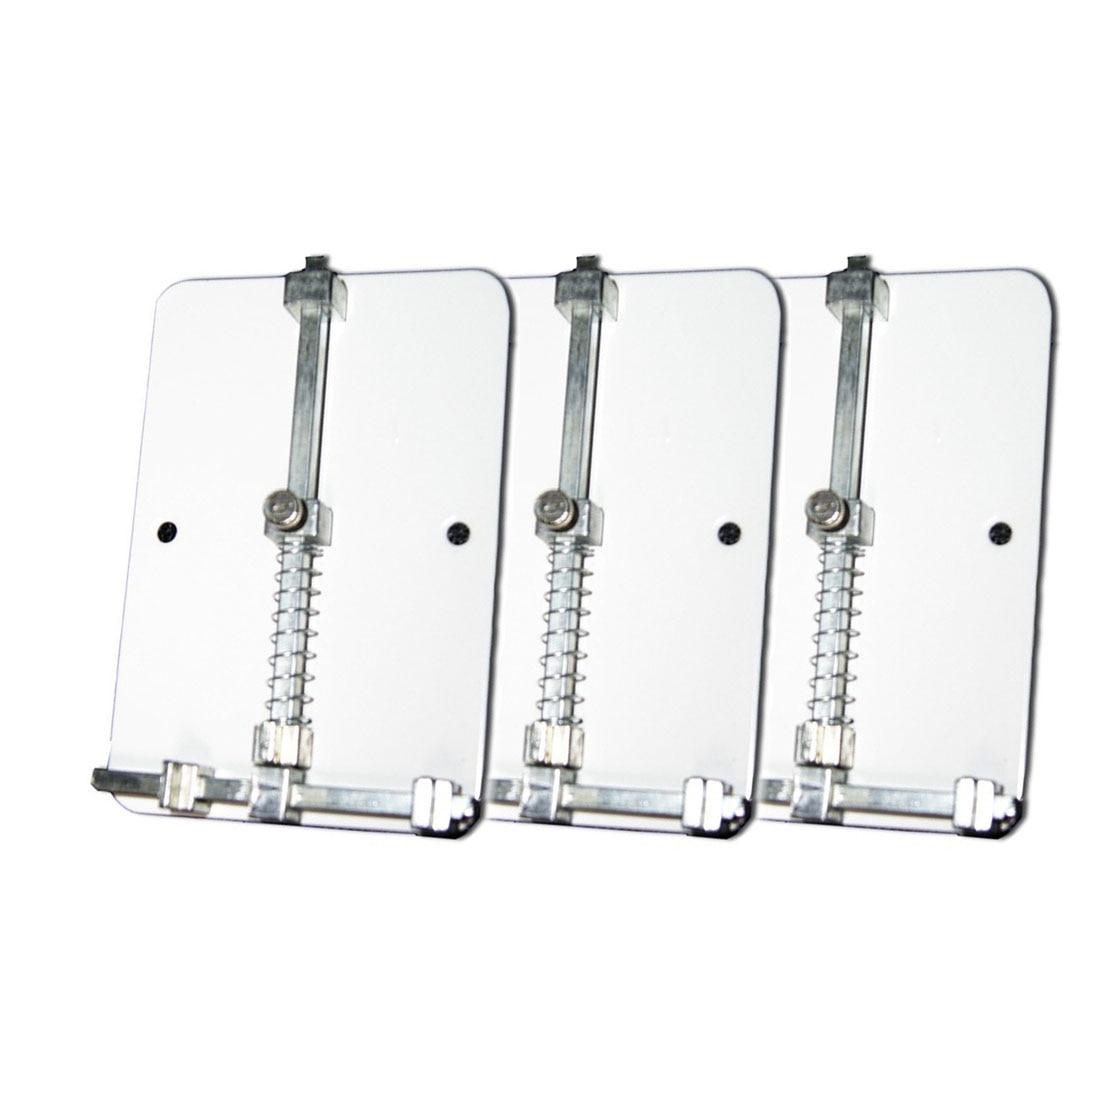 Motherboard PCB Holder 8*12cm Fixture For Mobile Phone Board Repair Tool Hand Tool SetMotherboard PCB Holder 8*12cm Fixture For Mobile Phone Board Repair Tool Hand Tool Set